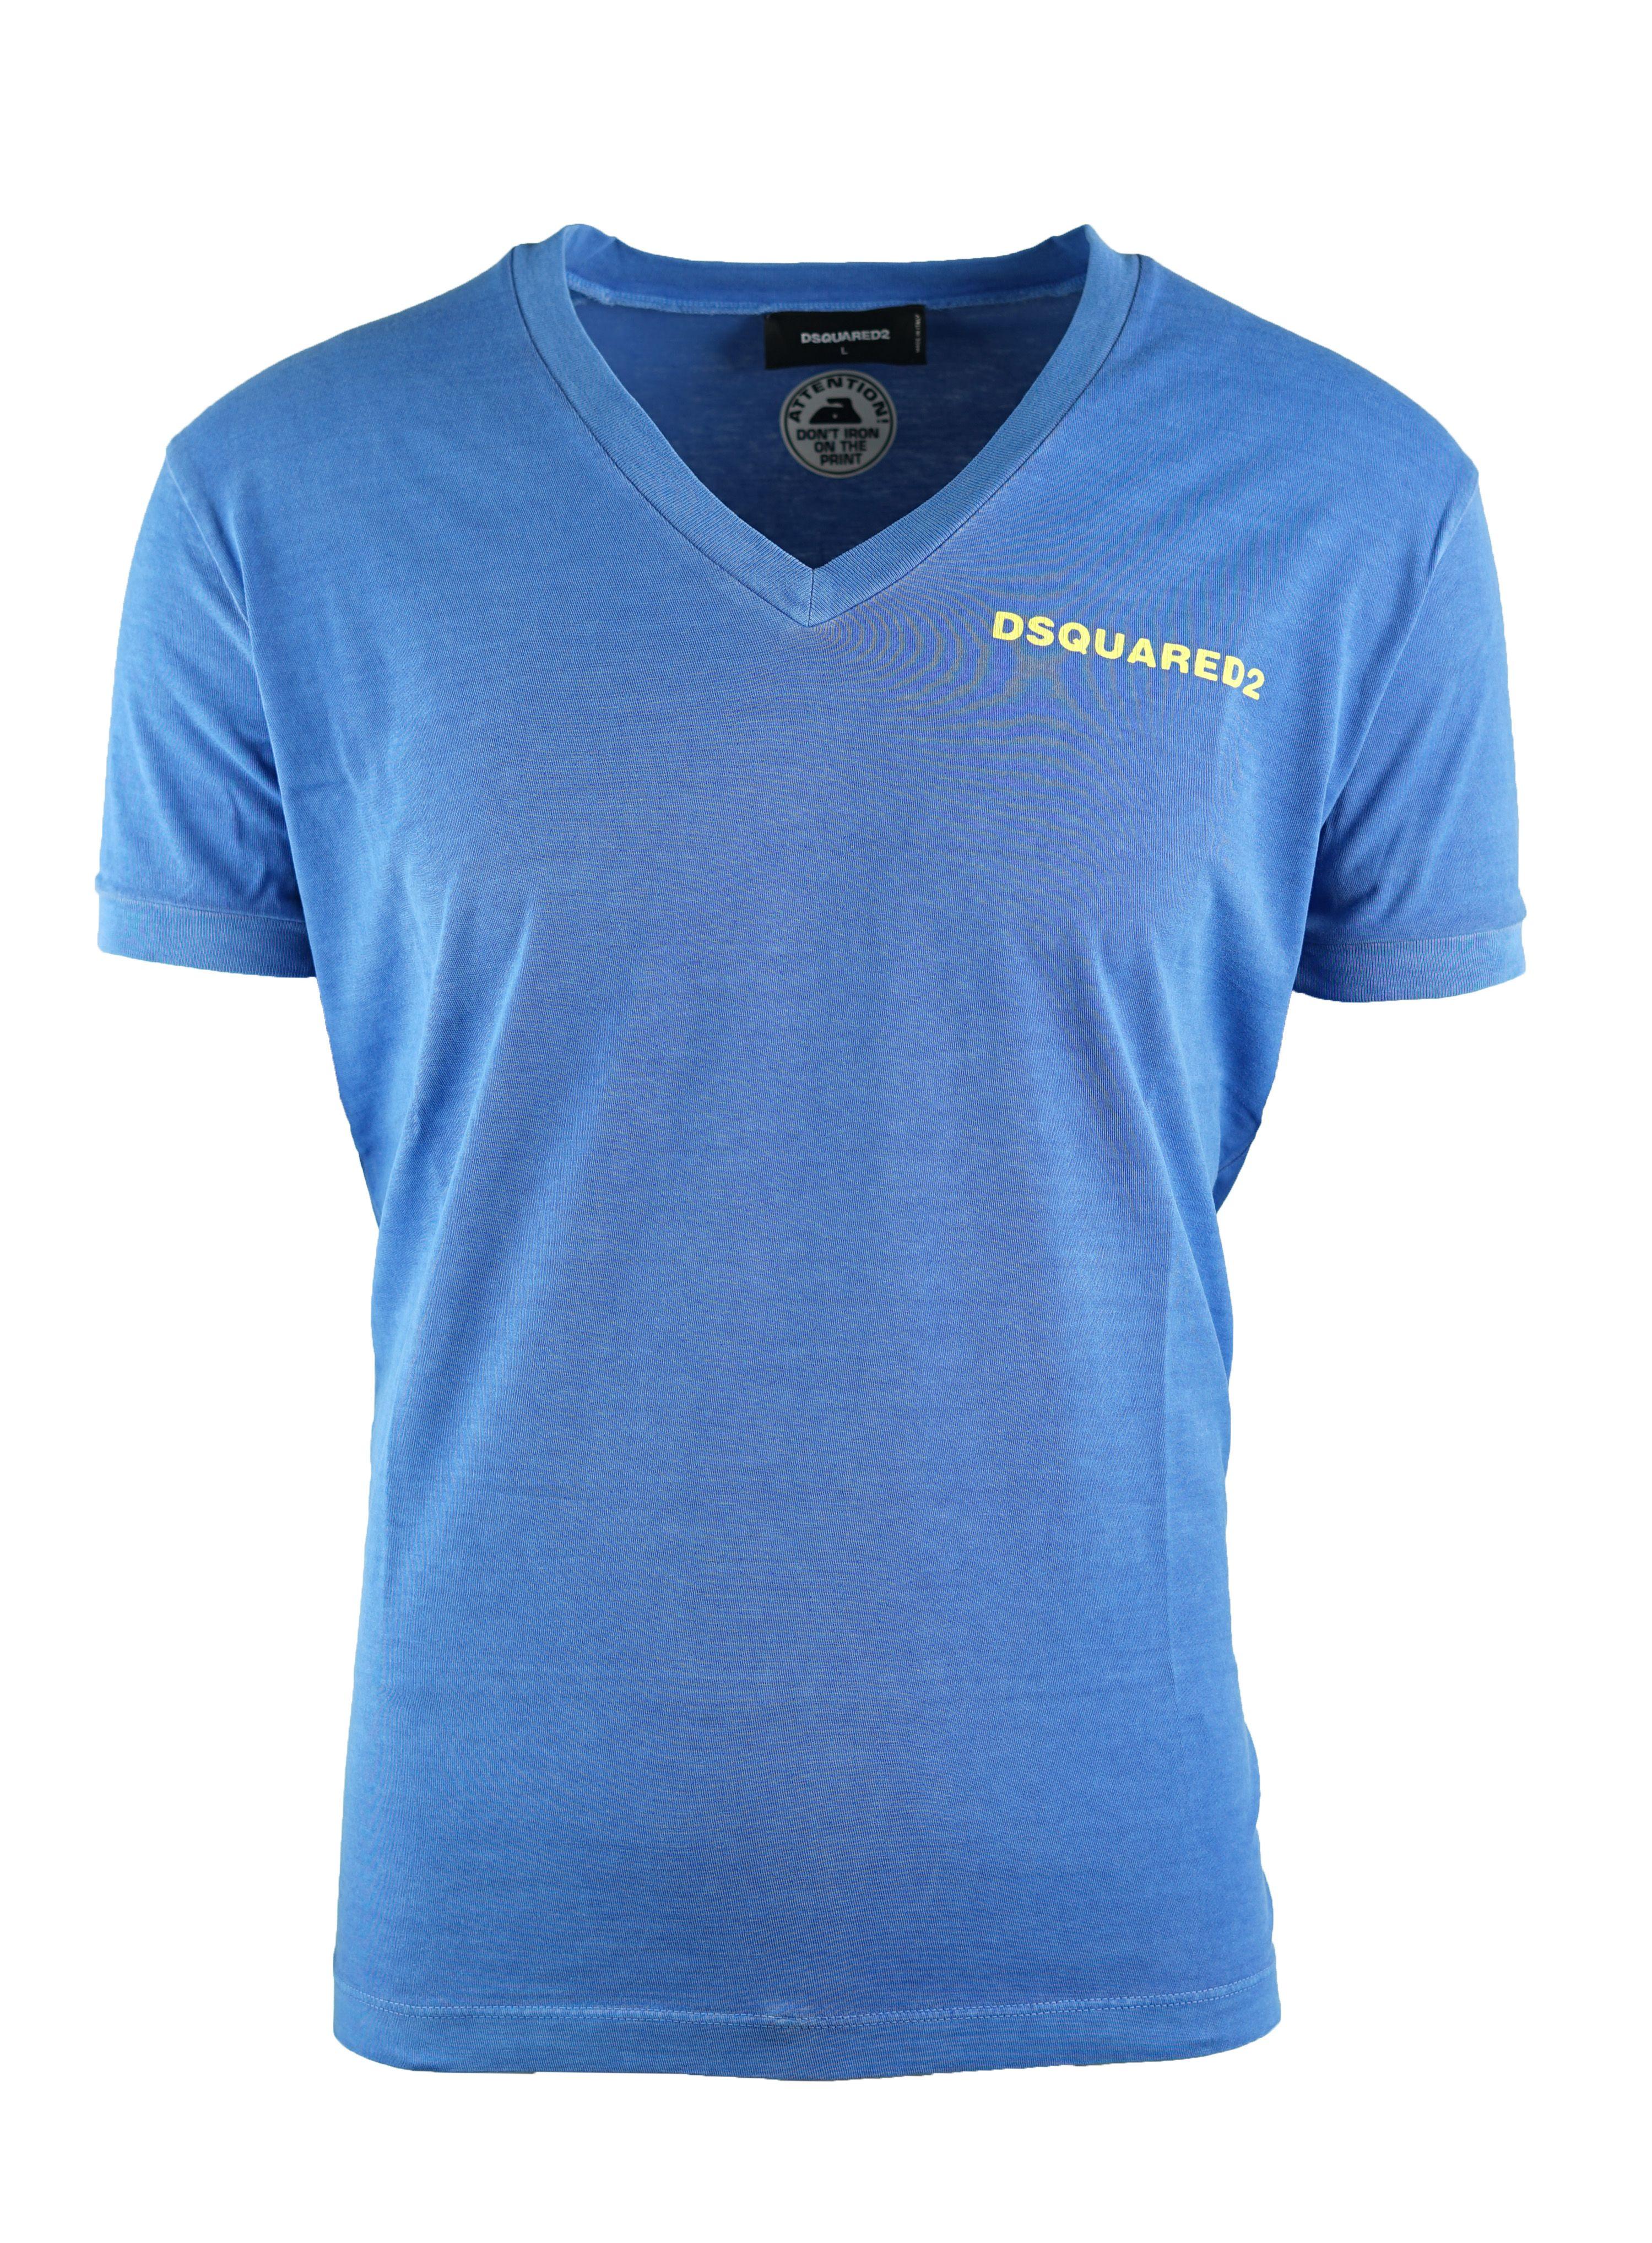 DSquared2 S74GD0203 S20694 519 Mens T-Shirt